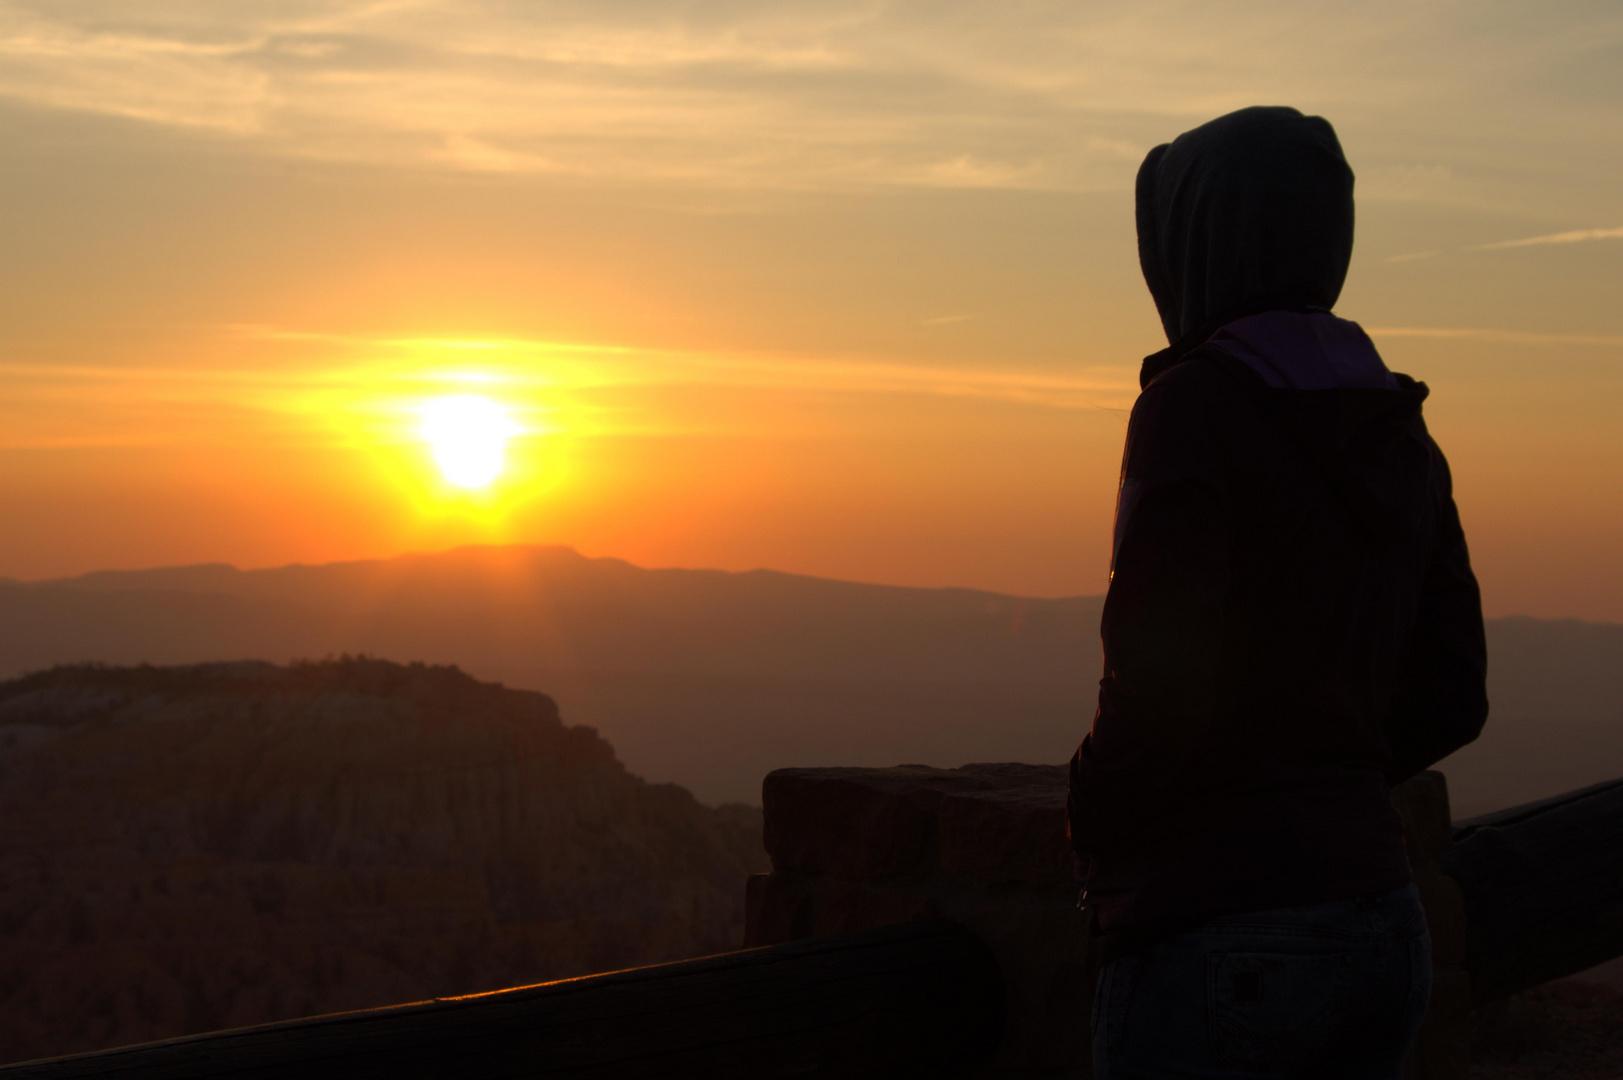 Sunrise II - Bryce Canyon, Utah, USA